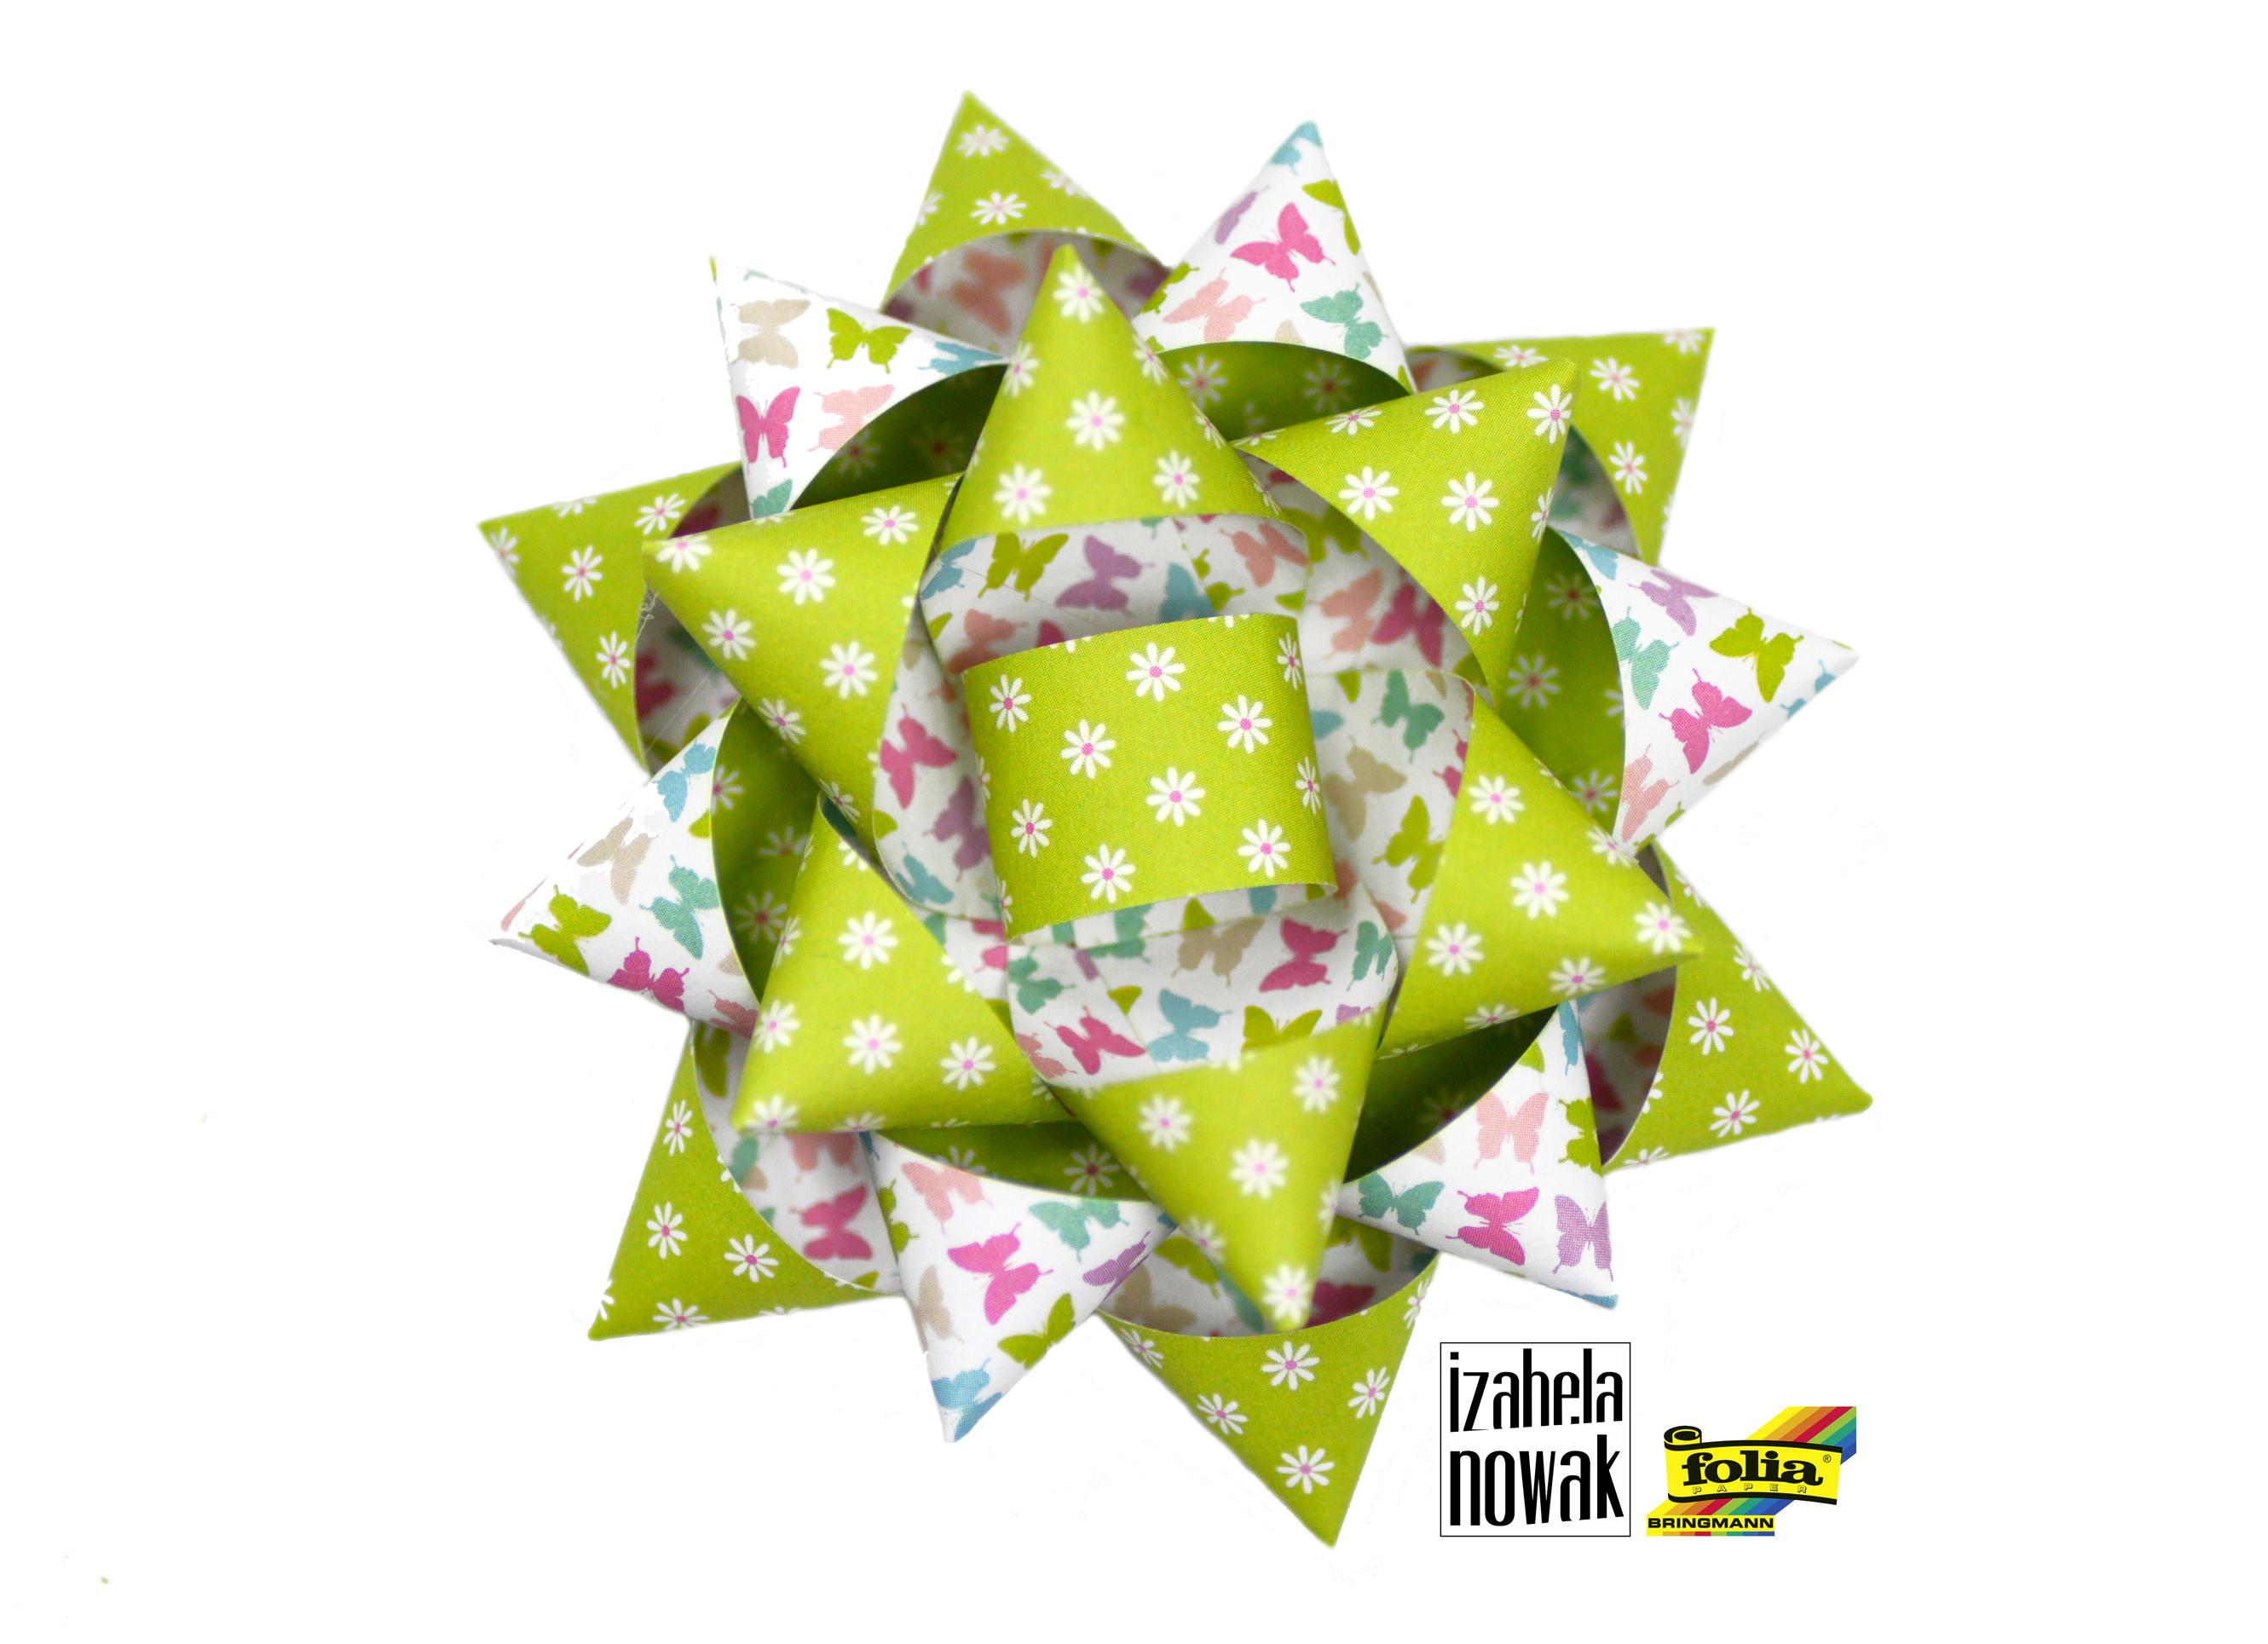 Izabela Nowak paperart ribbon